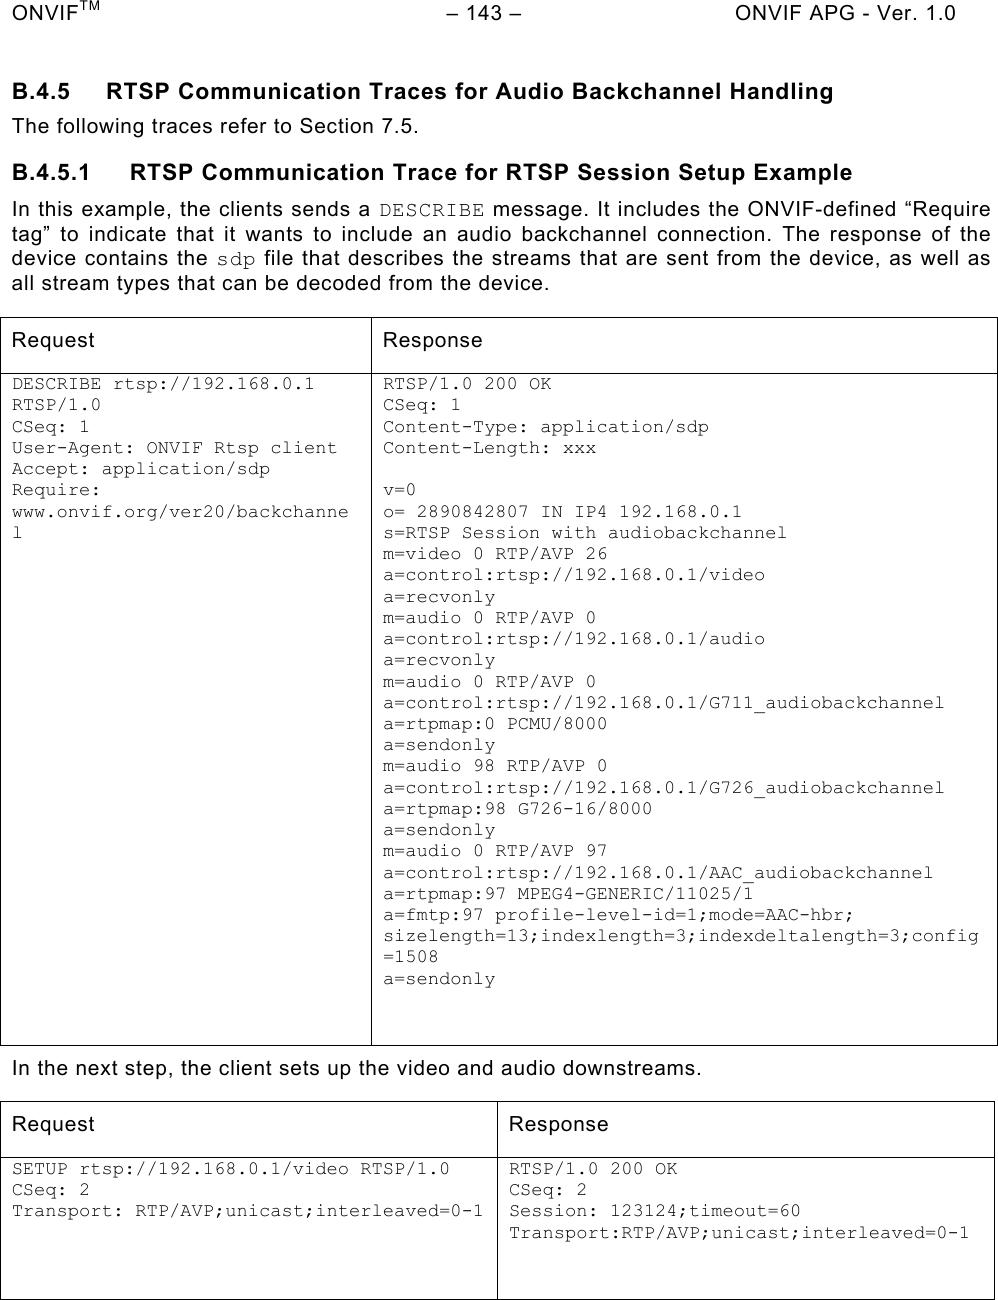 ONVIF Appicaltion Programmer's Guide ONVIF_WG APG